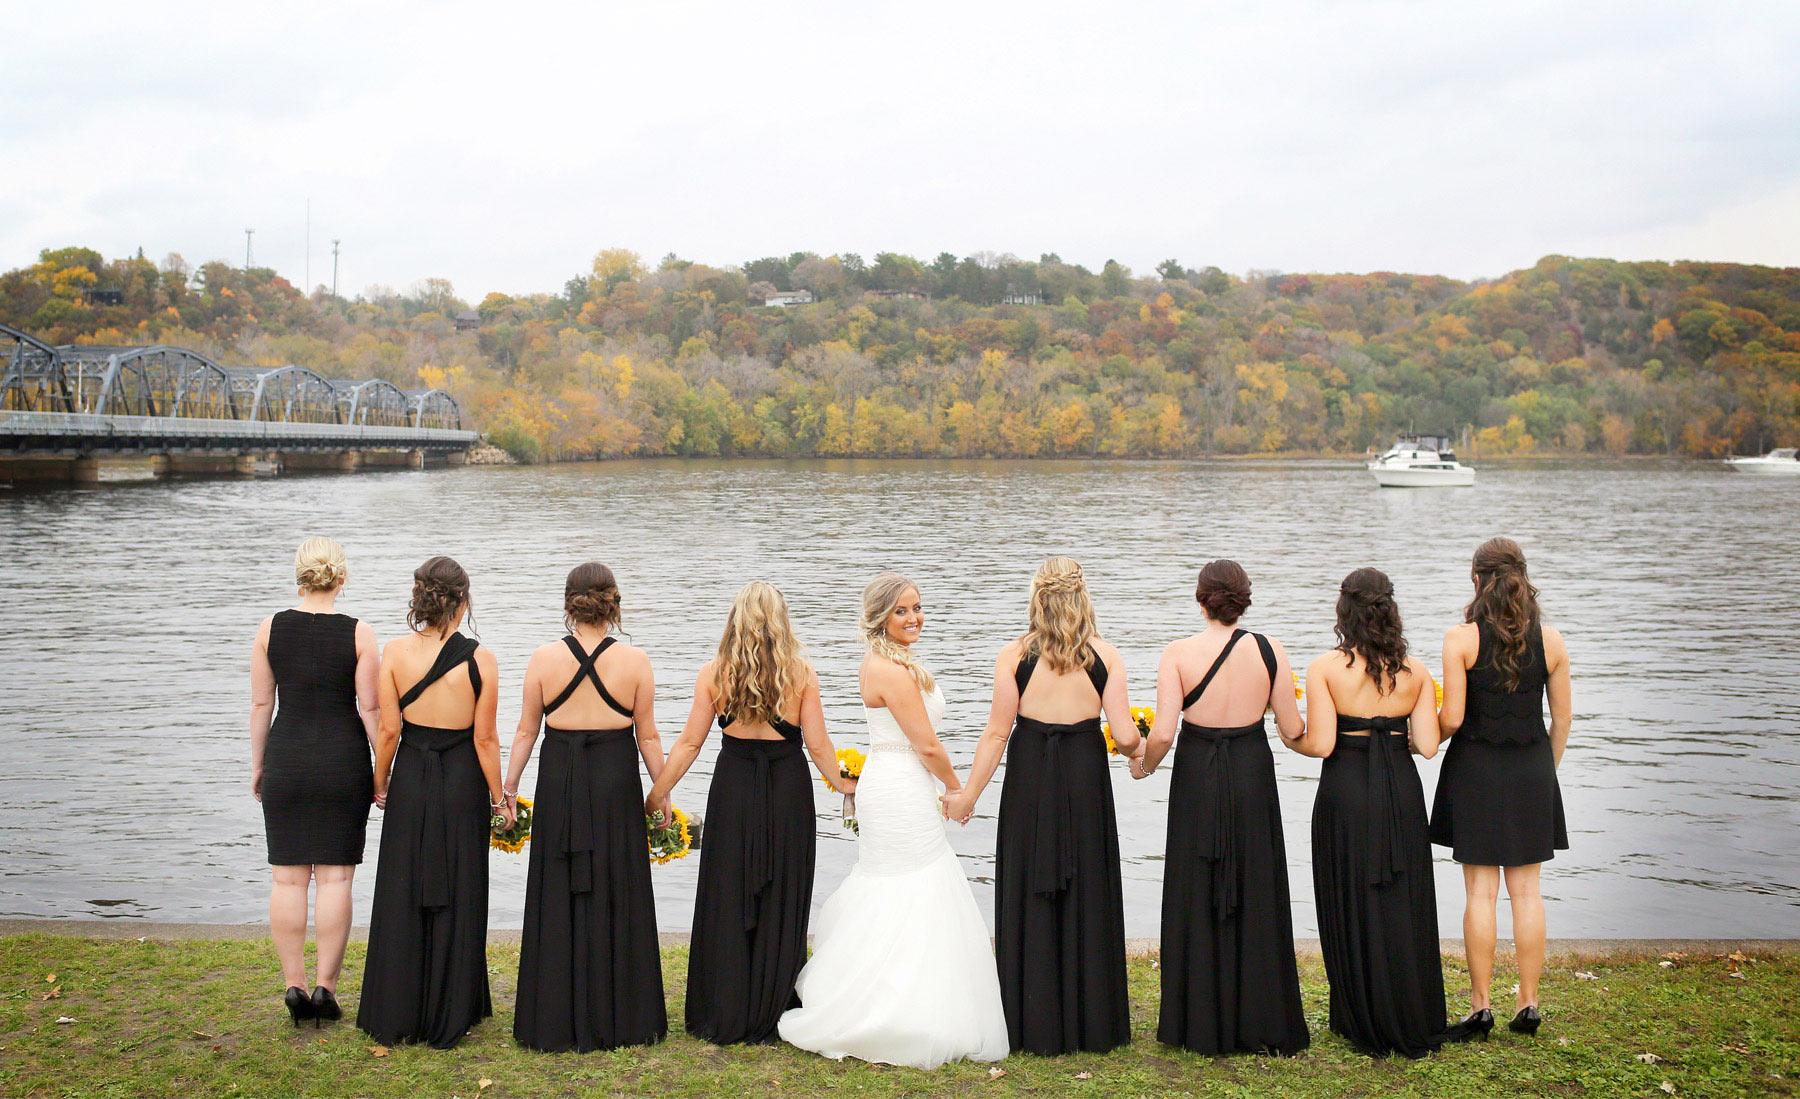 10-Stillwater-Minnesota-Wedding-Photographer-by-Andrew-Vick-Photography-Fall-Autumn-Lift-Bridge-Saint-Croix-River-Bride-Bridesmaids-Sunflowers-Flowers-Micaela-and-Derek.jpg